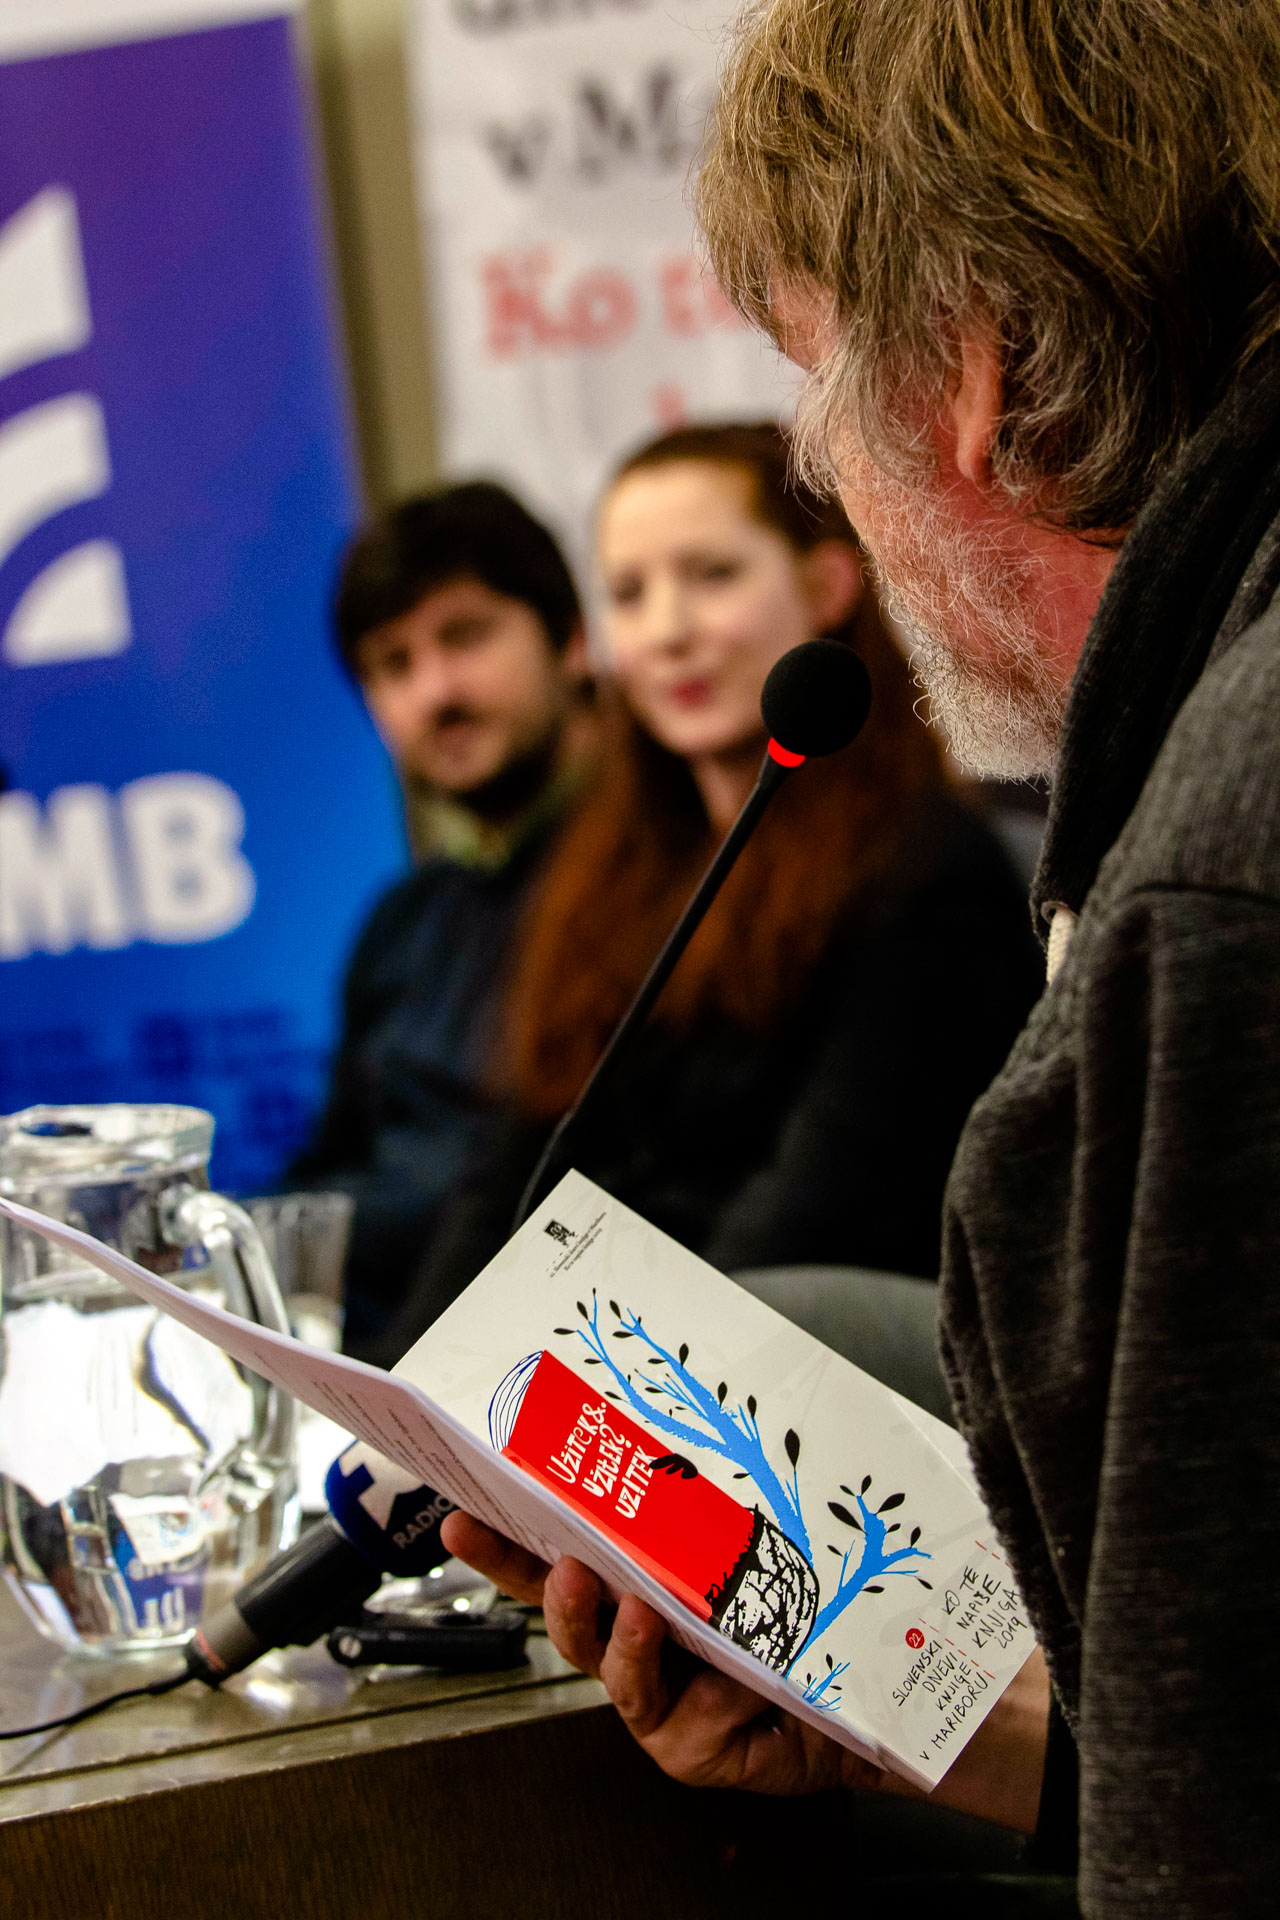 2019_04_15_DneviKnjige-tiskovka036.jpg